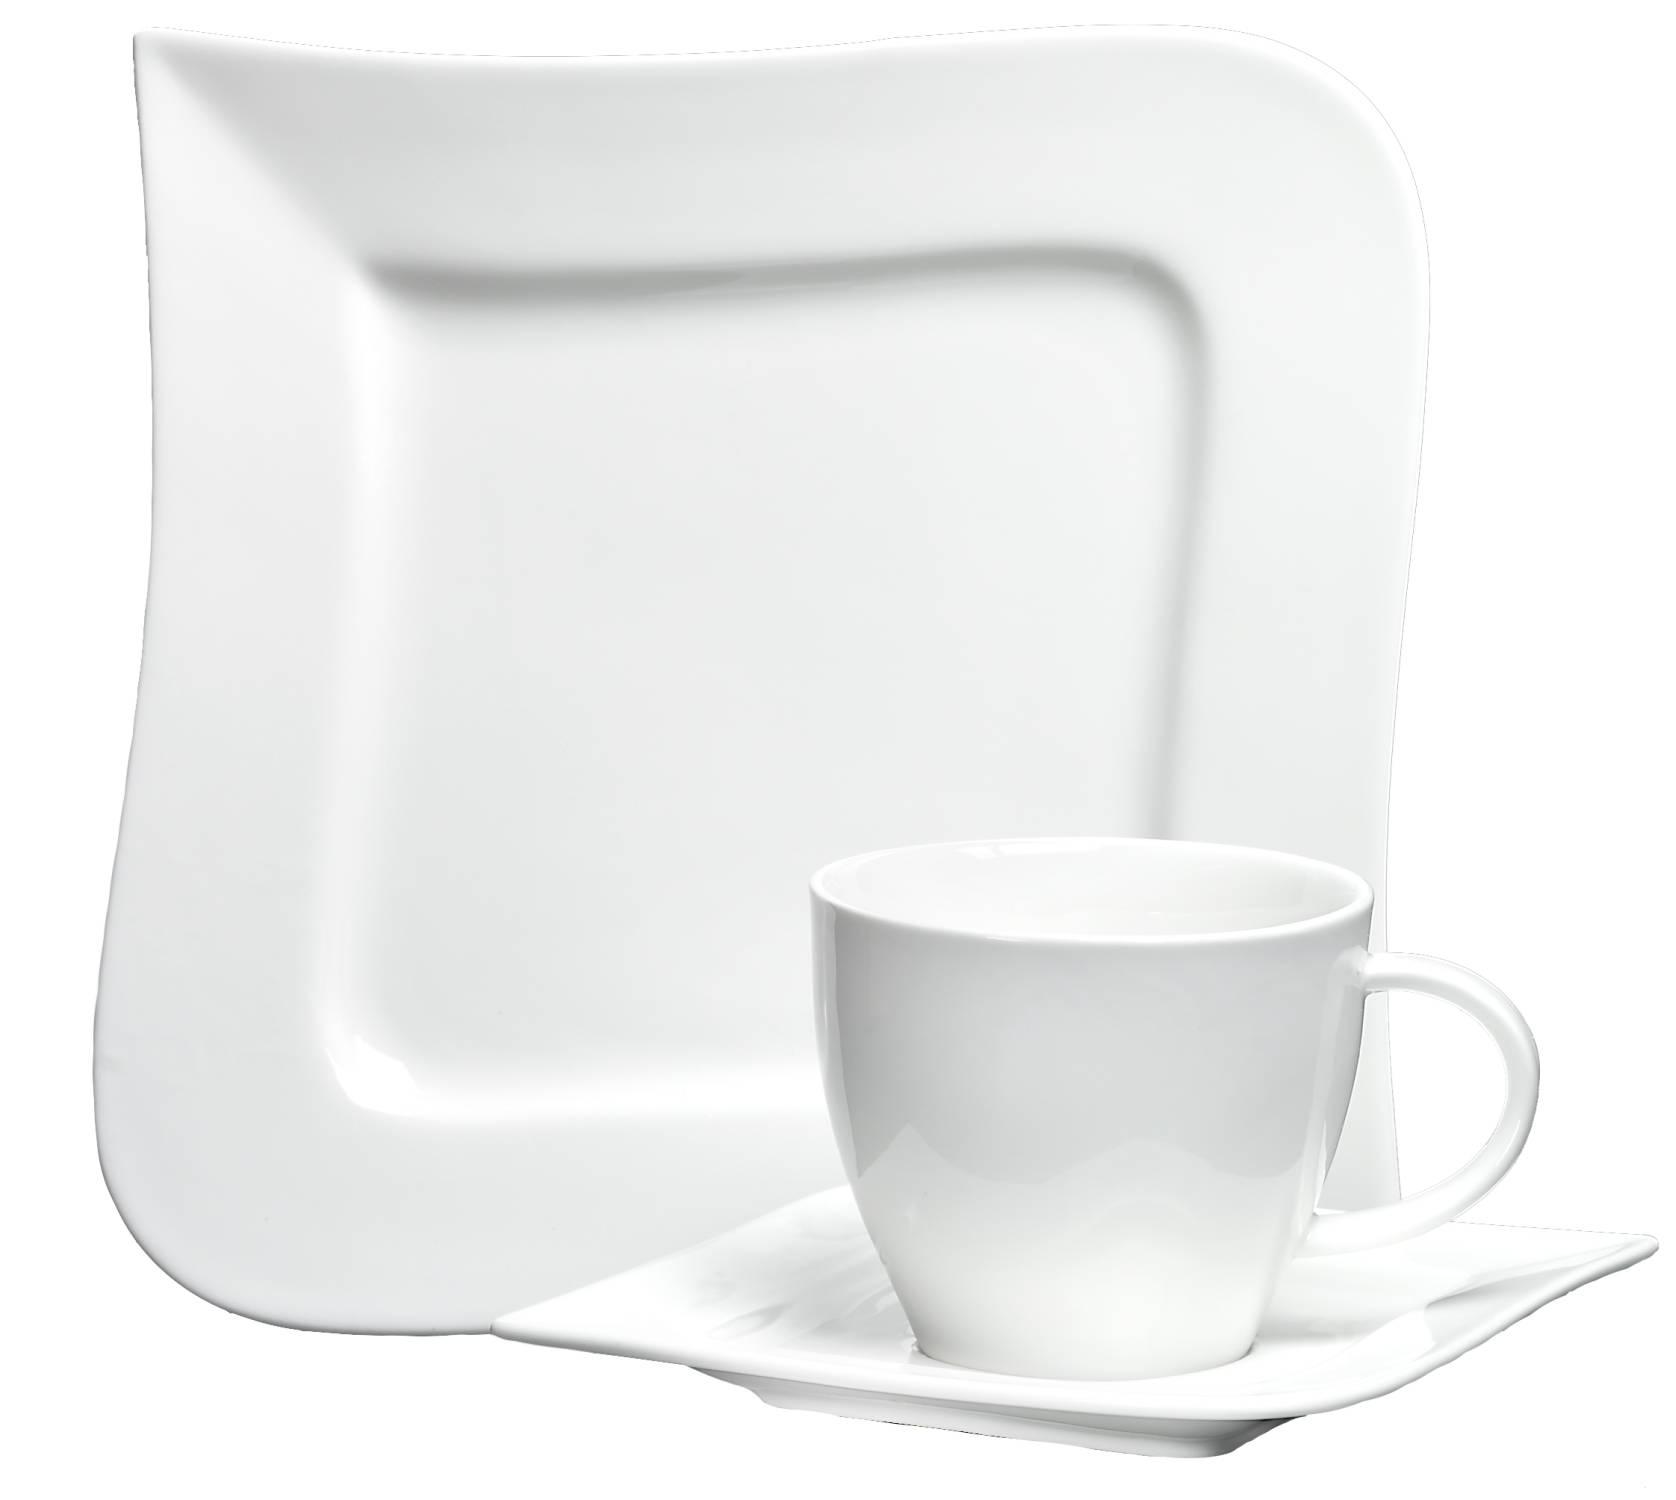 Ritzenhoff /& Breker Melodie Kaffeeservice 18tlg 80006 NEU